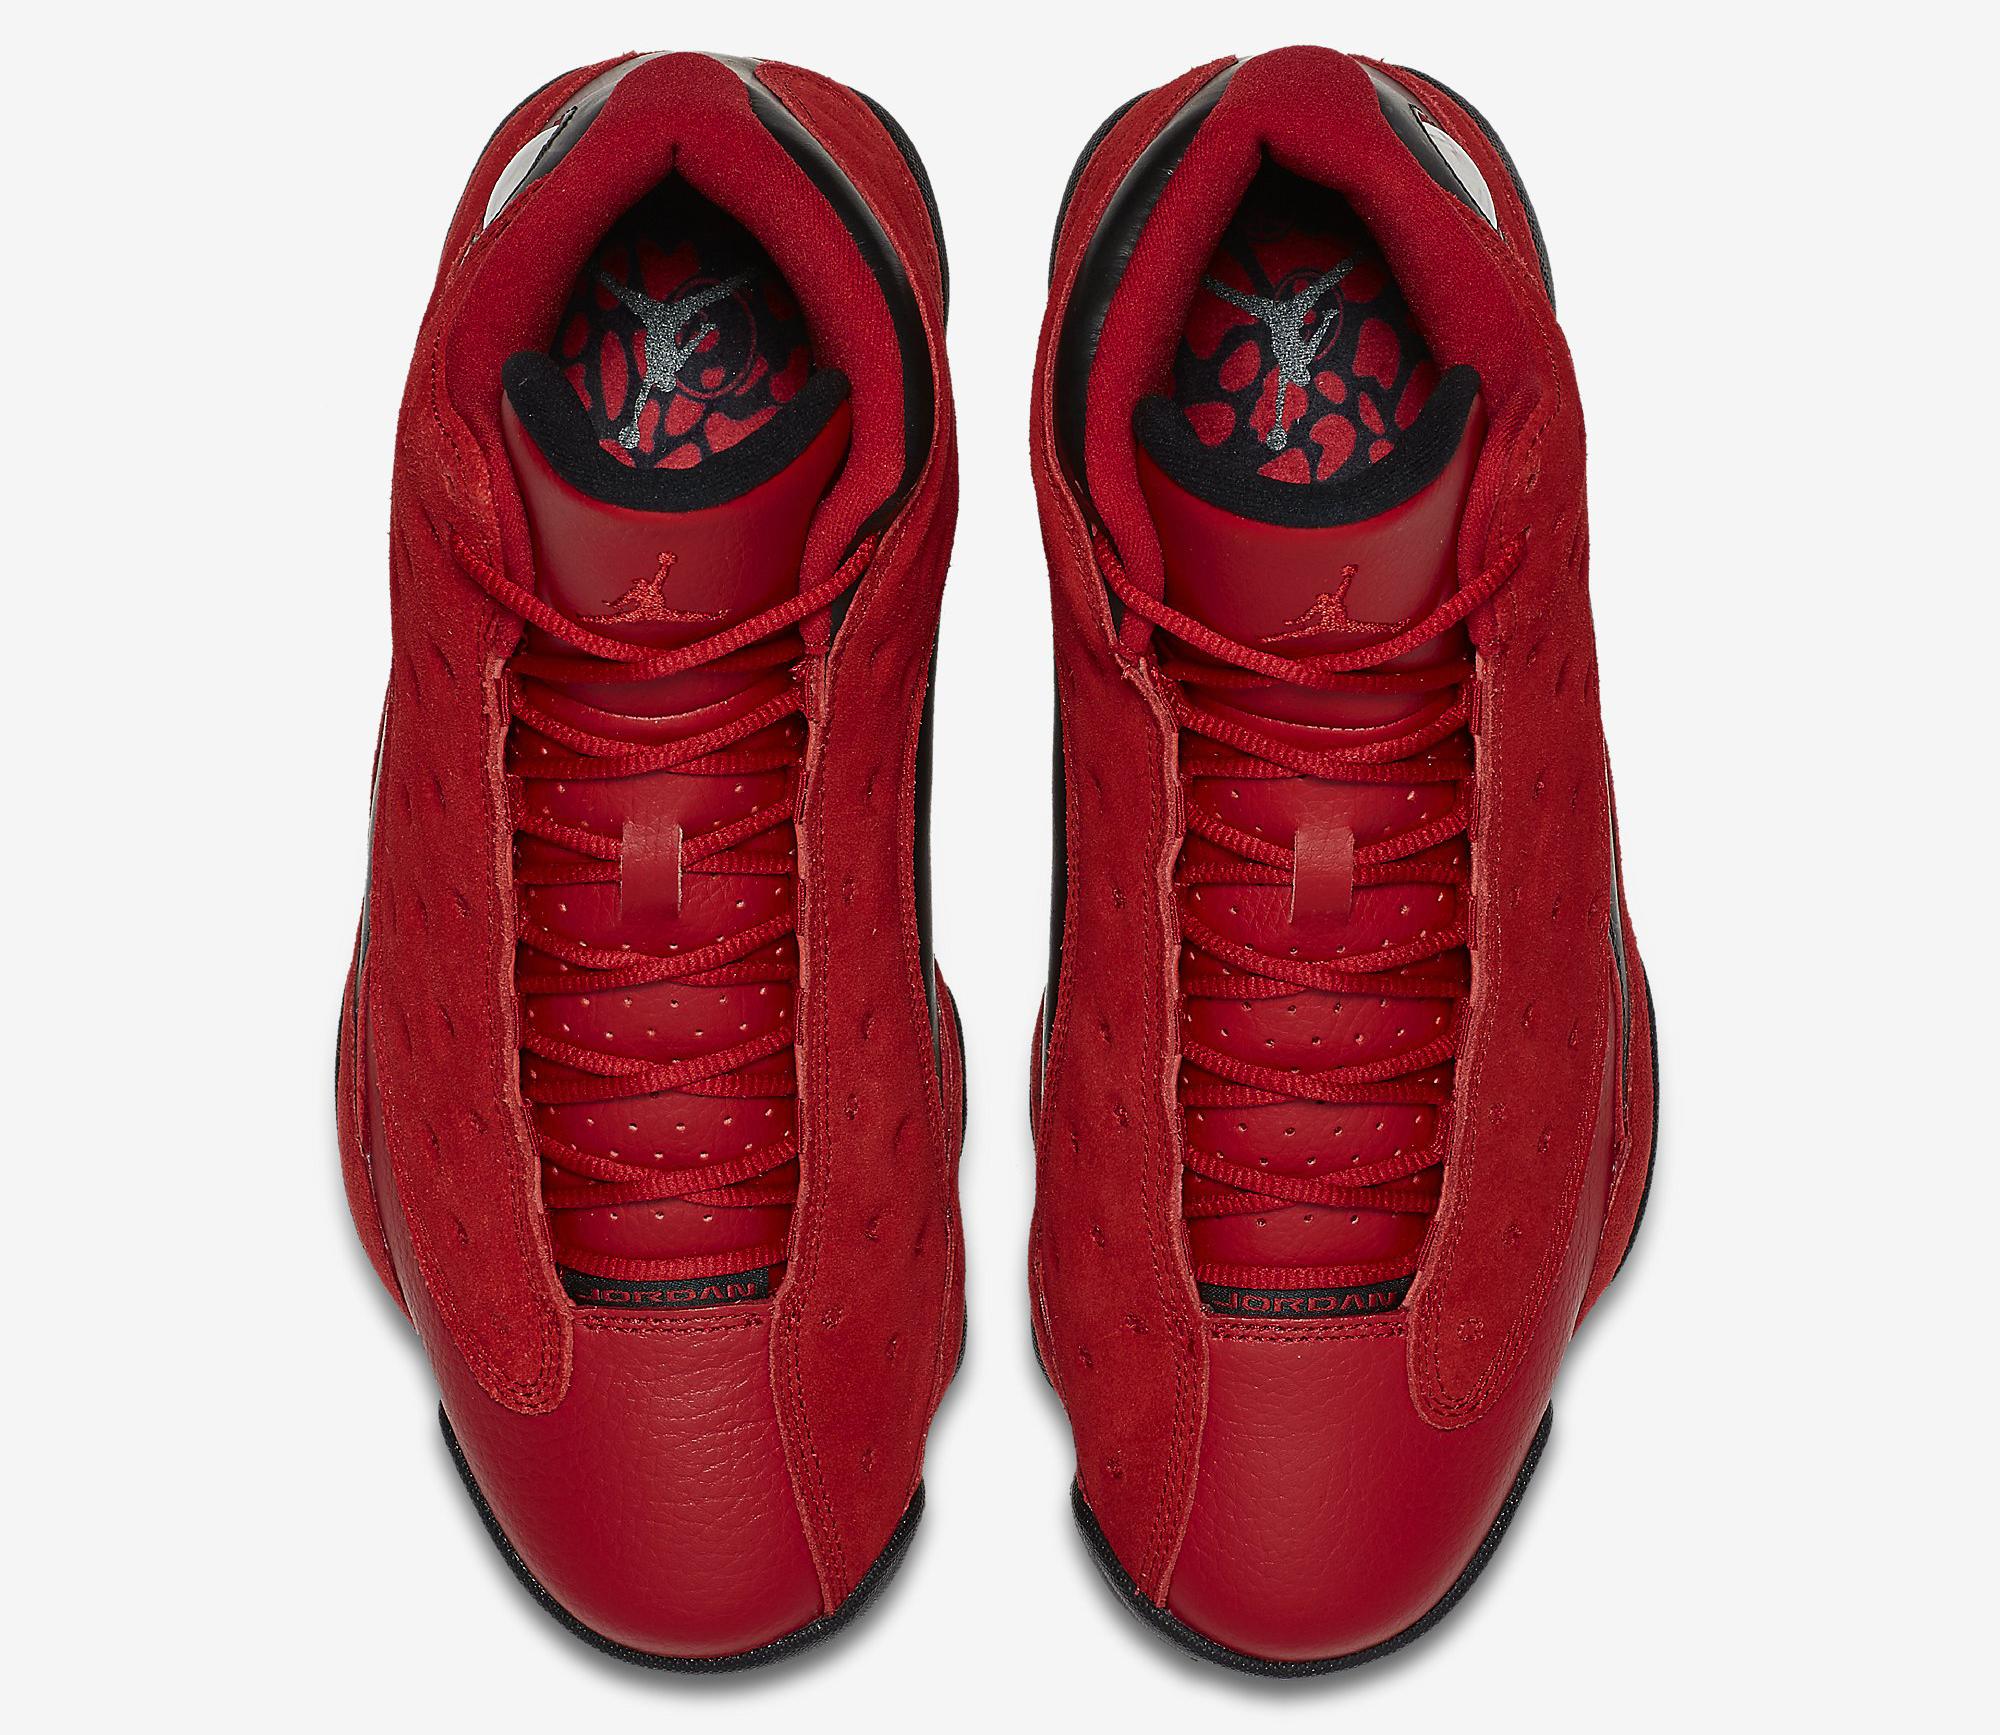 cheap for discount e4e36 f097d Image via Nike Singles Day Air Jordan 13 888164-601 Top